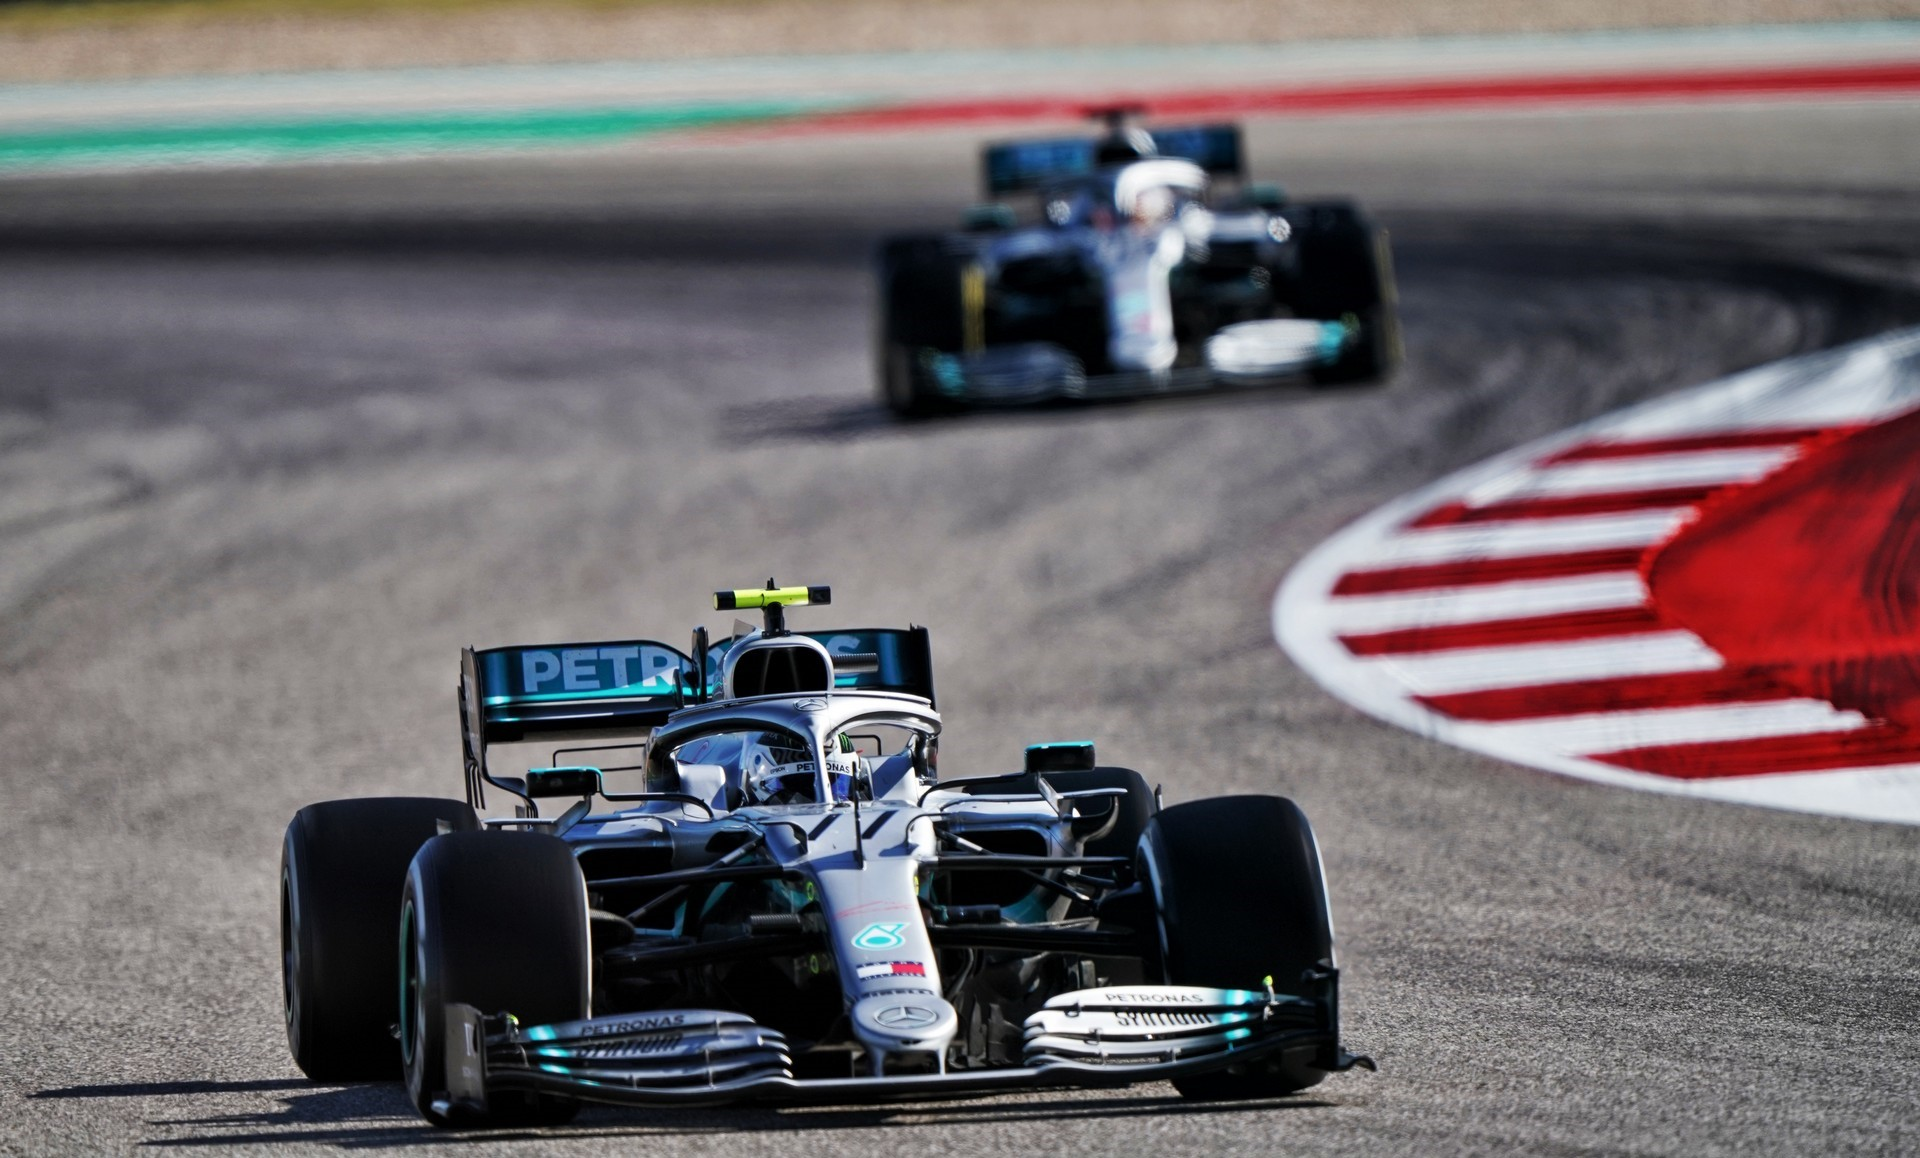 Analisi GP degli Stati Uniti: Mercedes-AMG Petronas